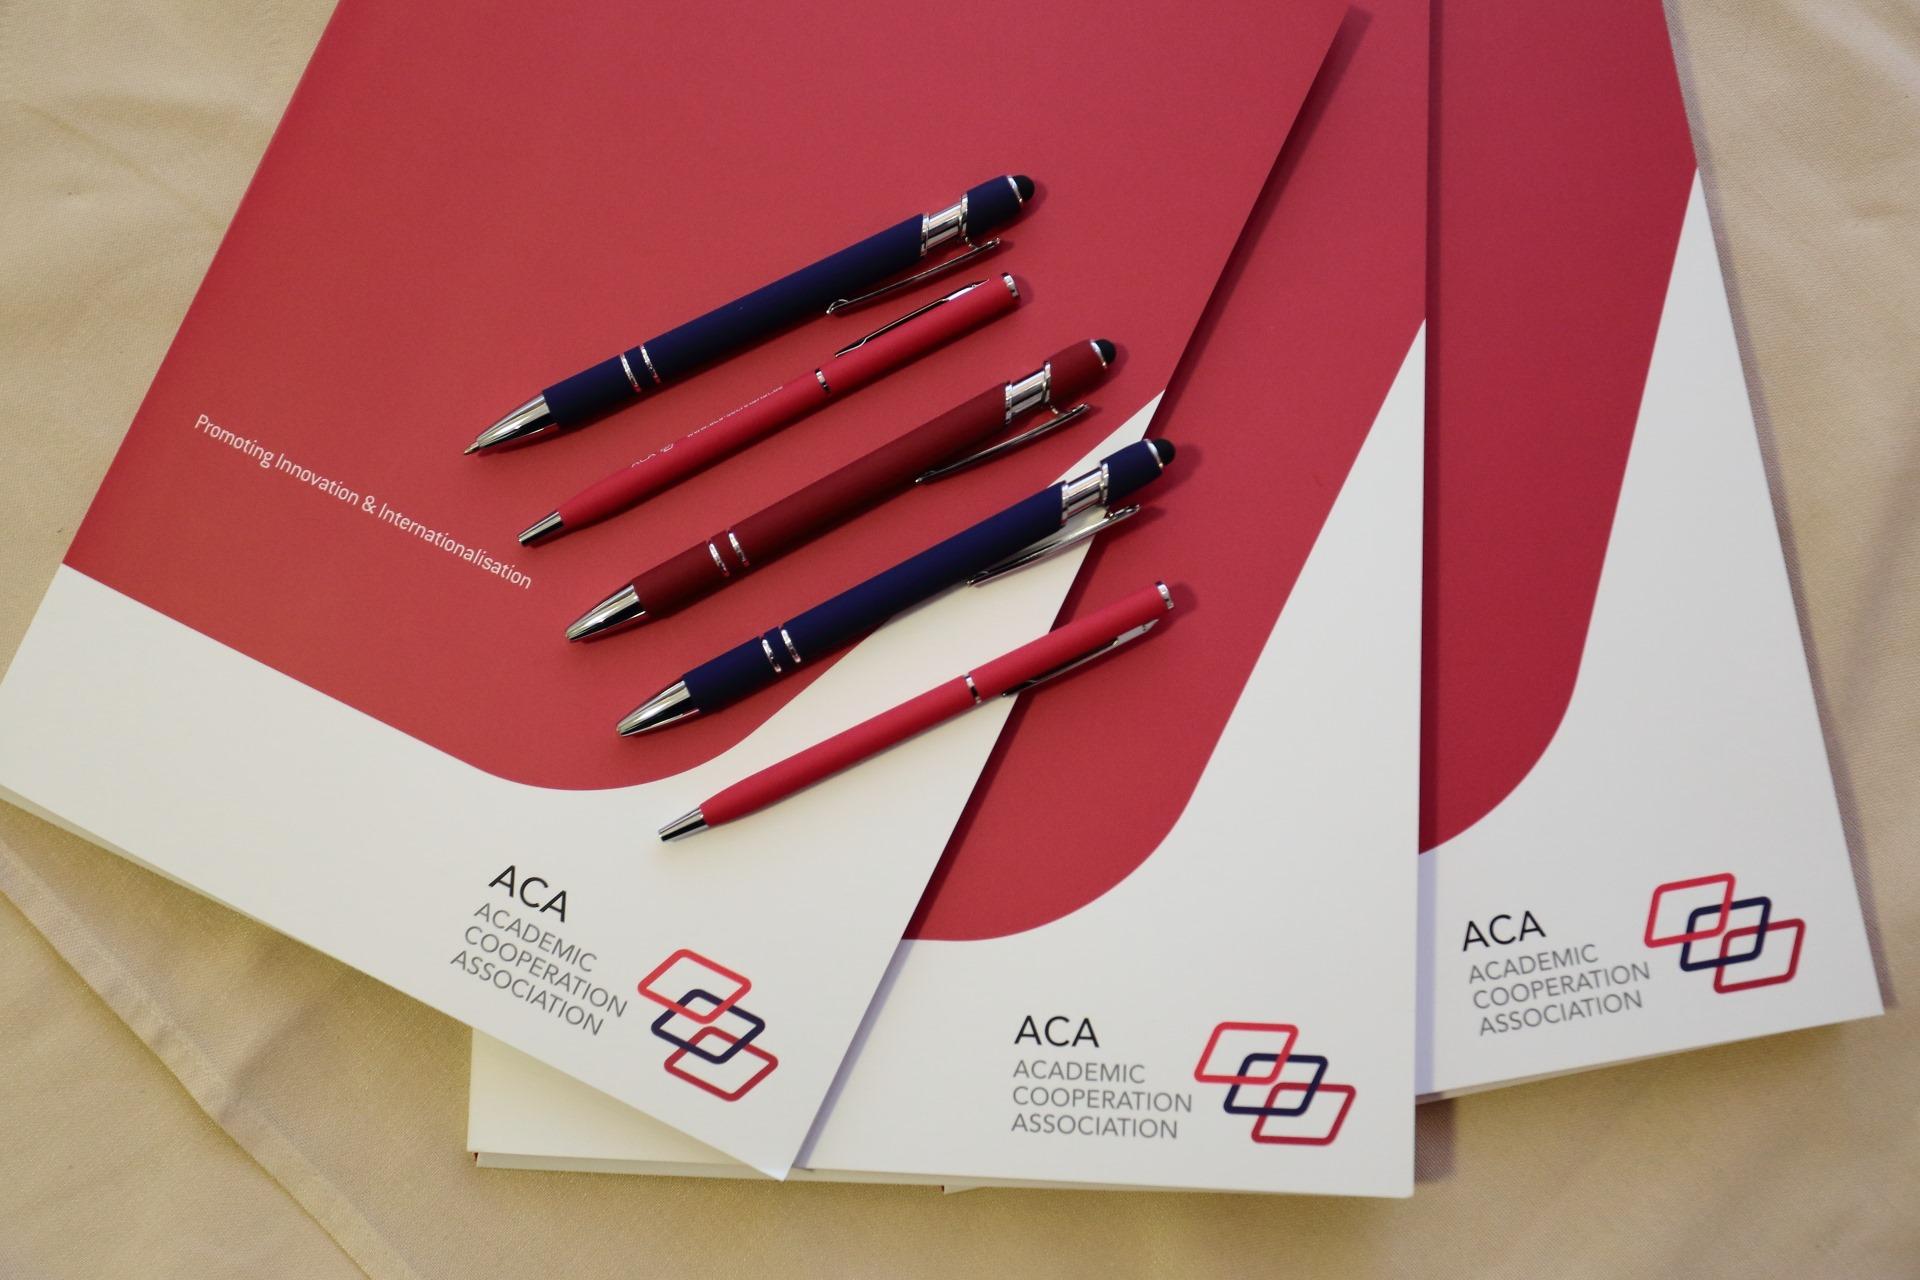 Ilustrativna fotografija Udruženja za akademsku suradnju - ACA; https://aca-secretariat.be/